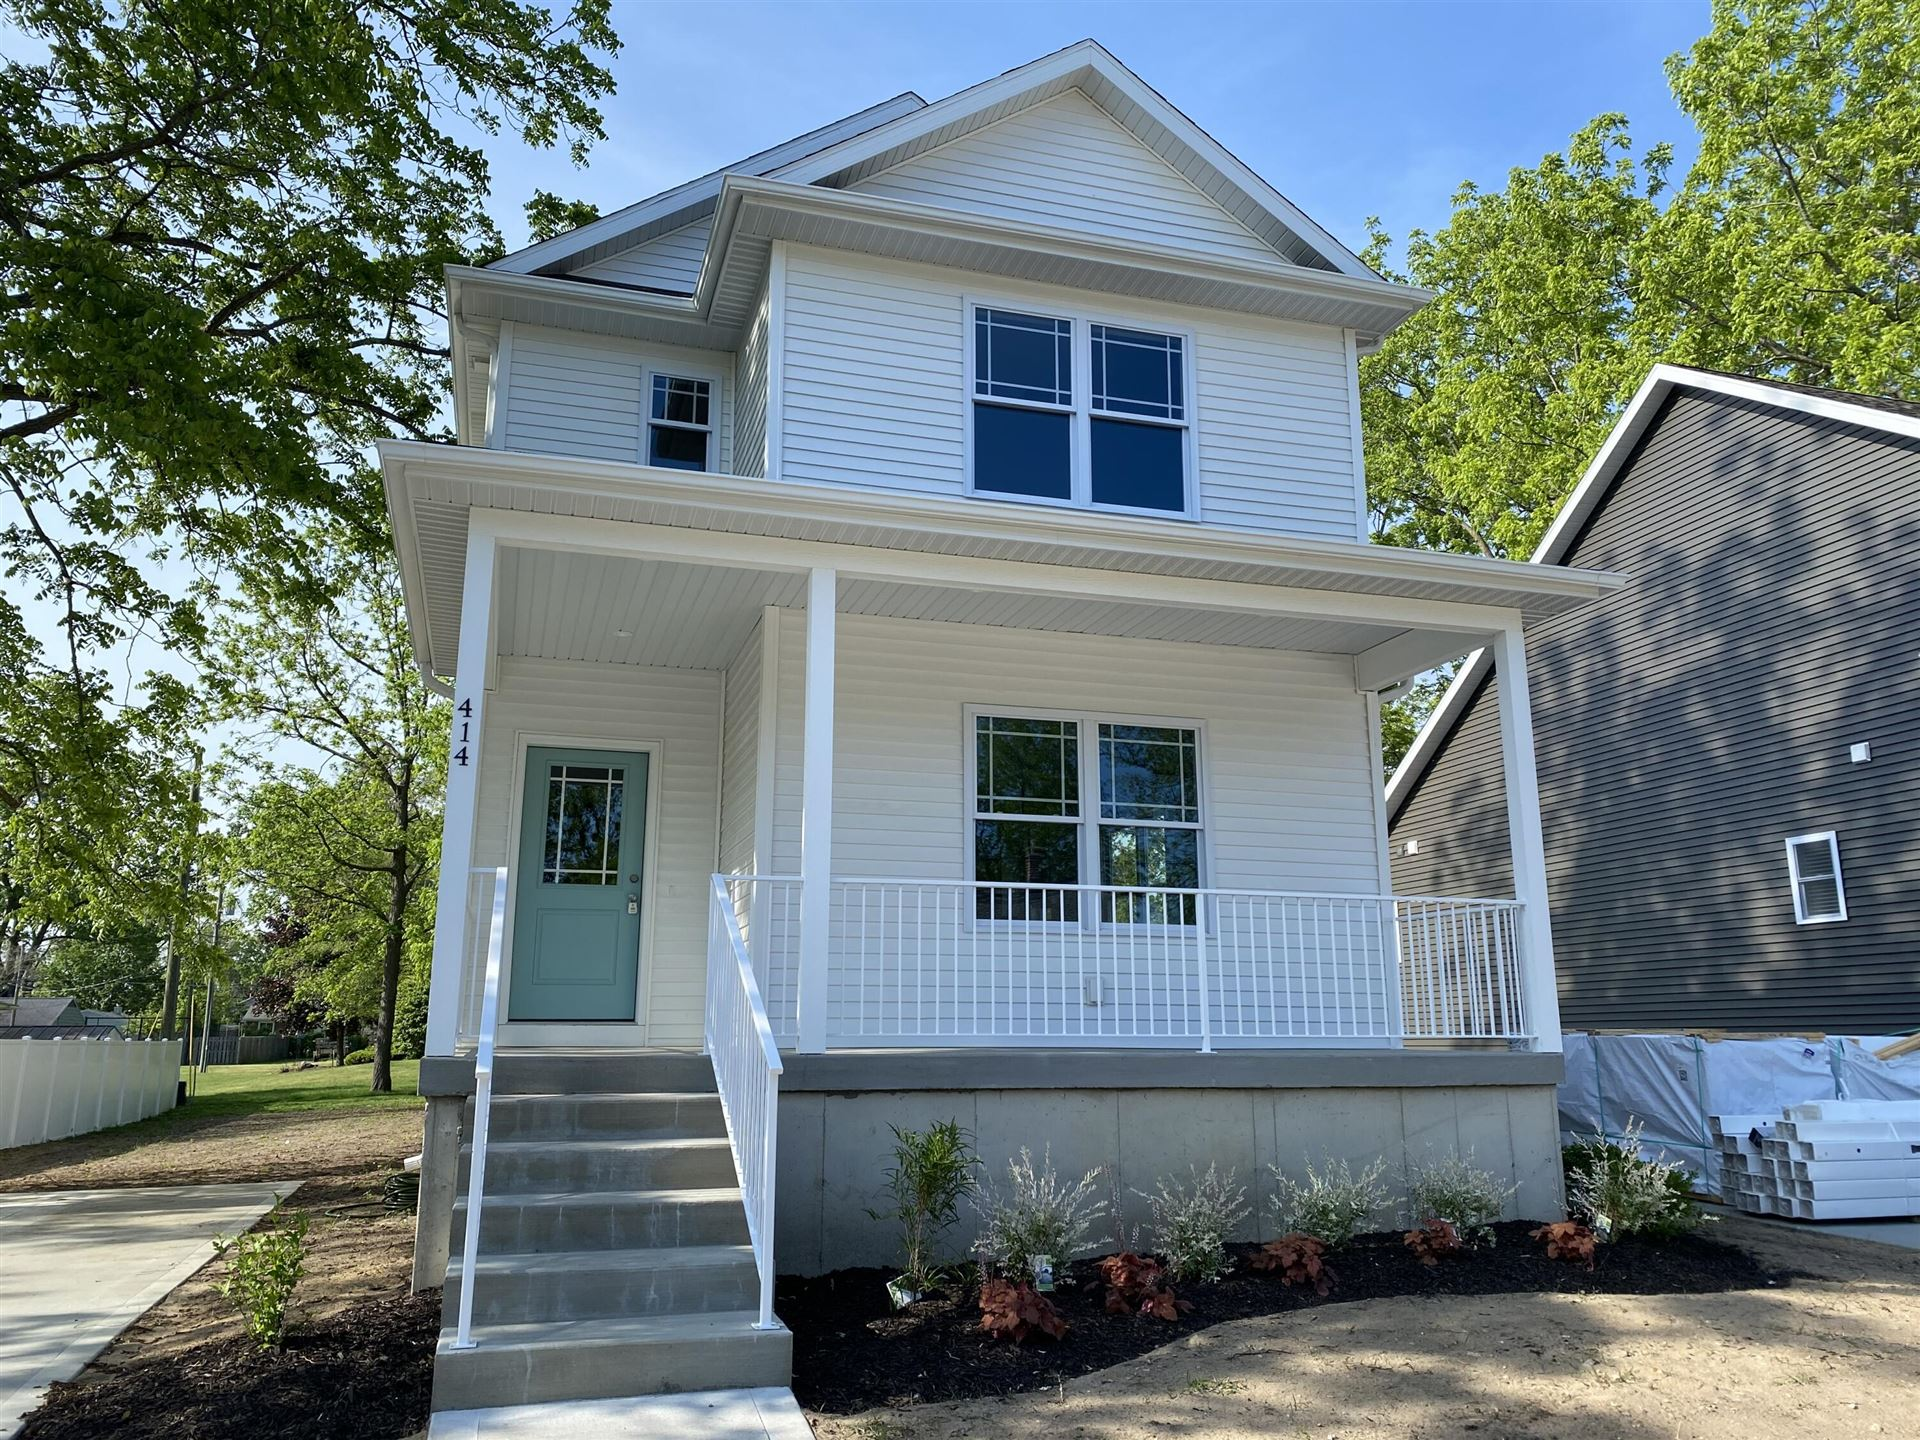 414 Edgell Street, South Haven, MI 49090 - MLS#: 21000815